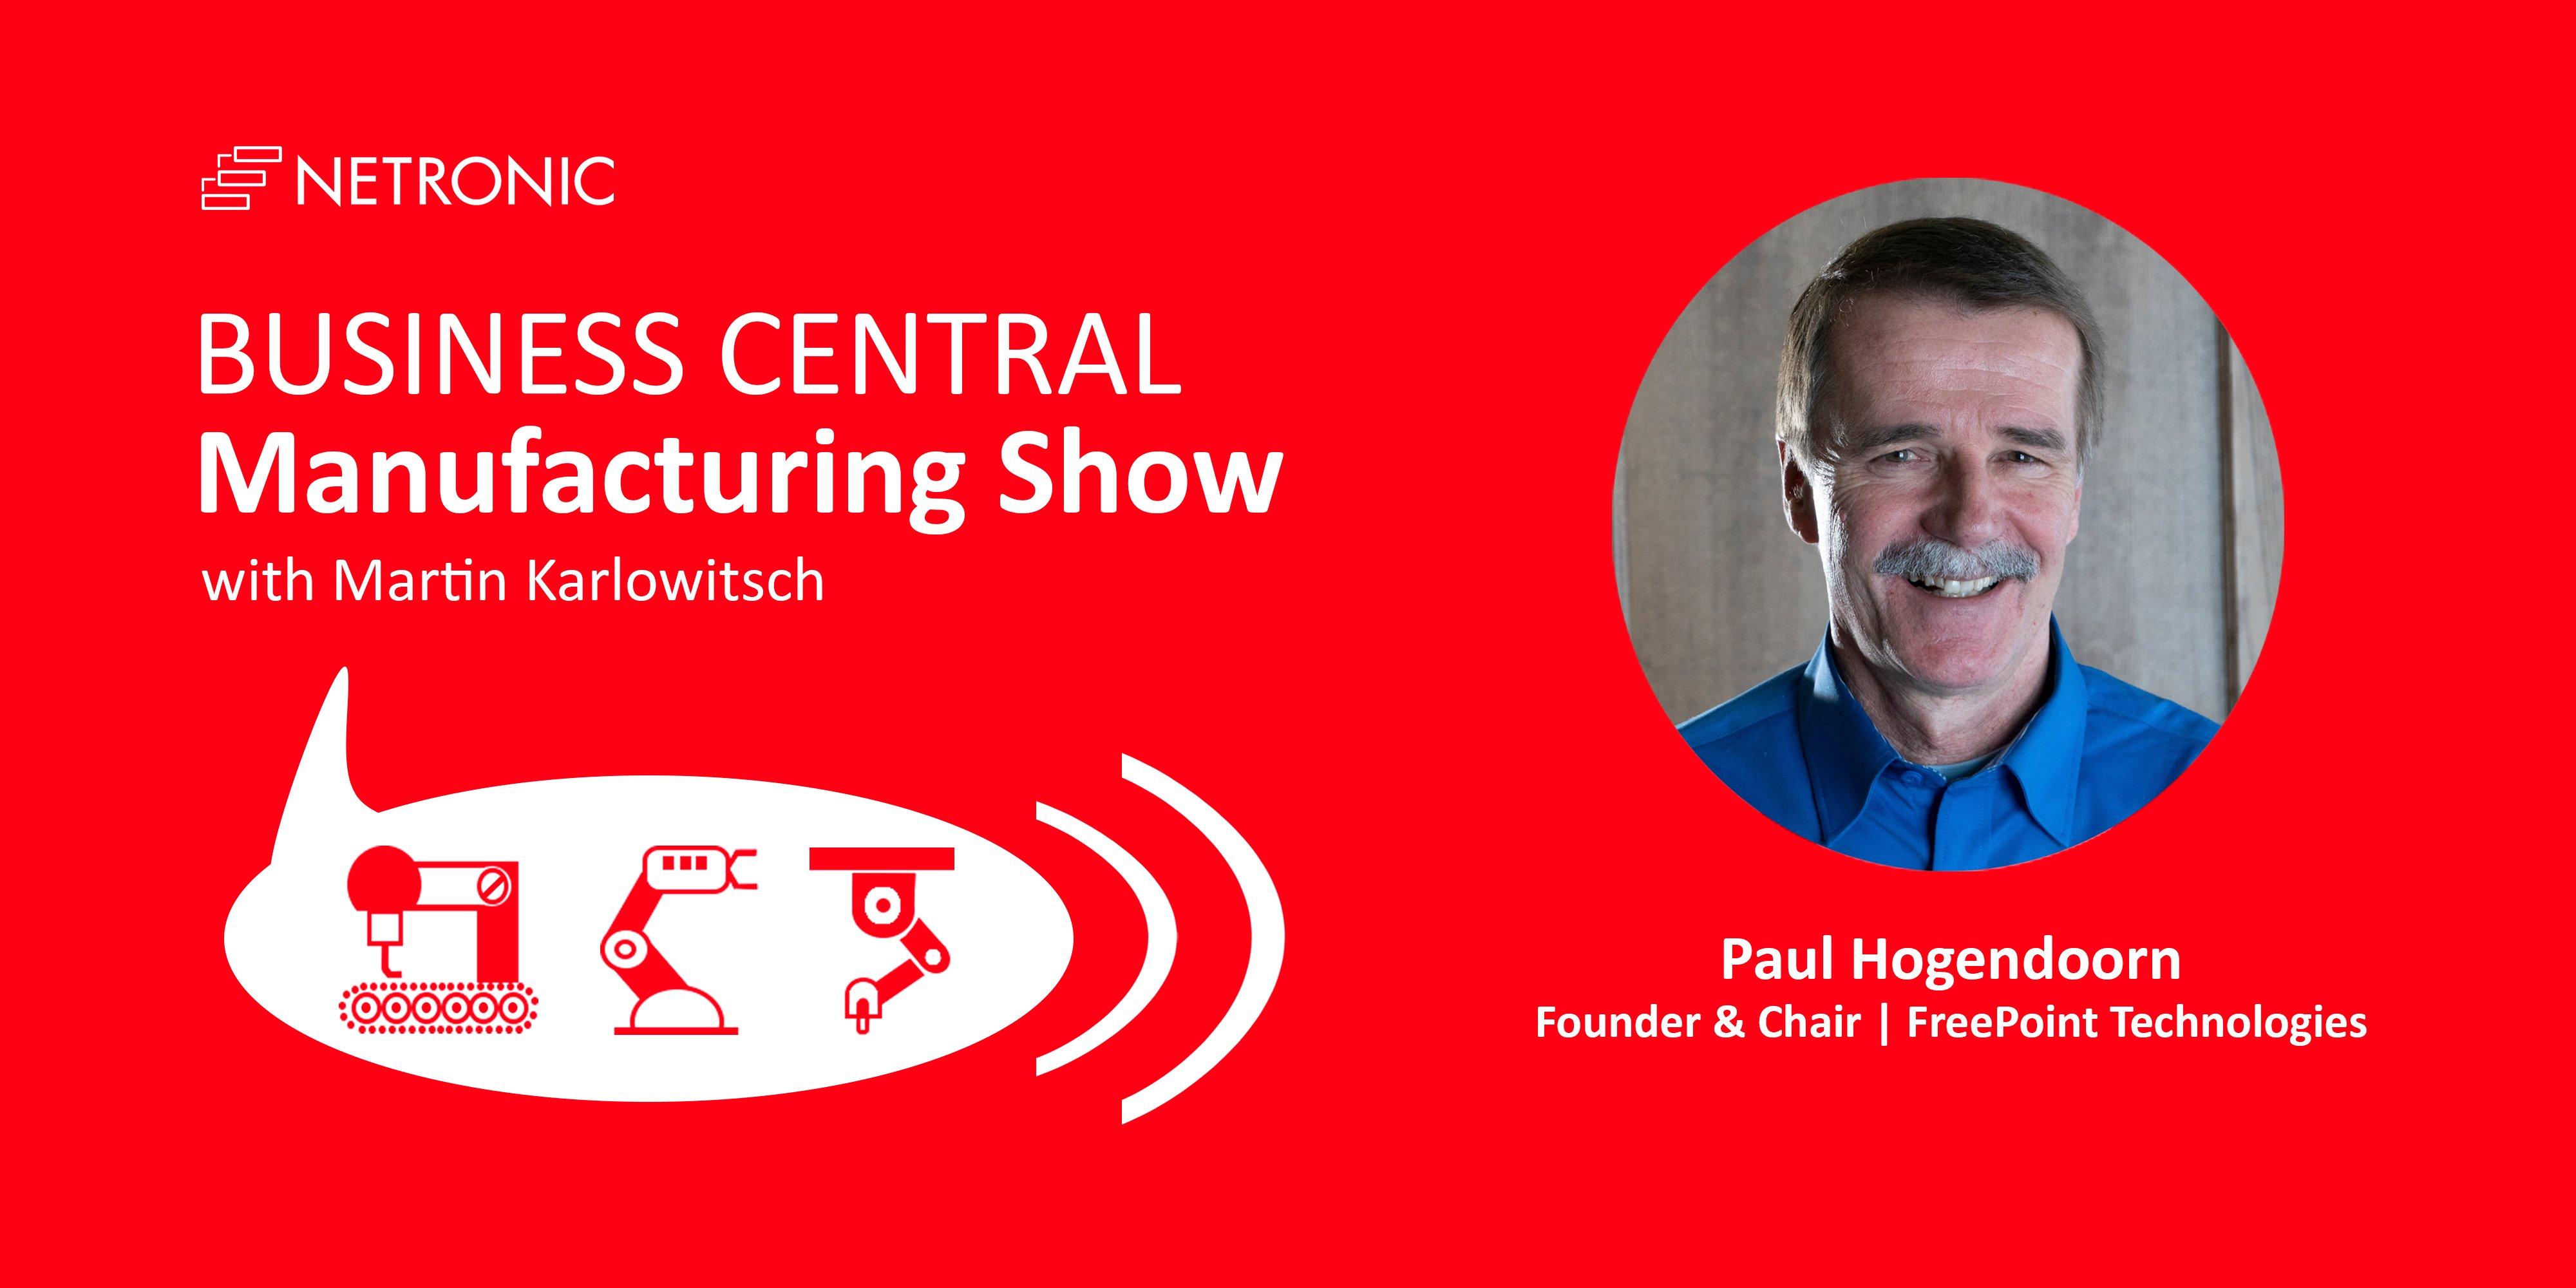 Business Central Manufacturing Show - Episode 12 - Paul Hogendoorn